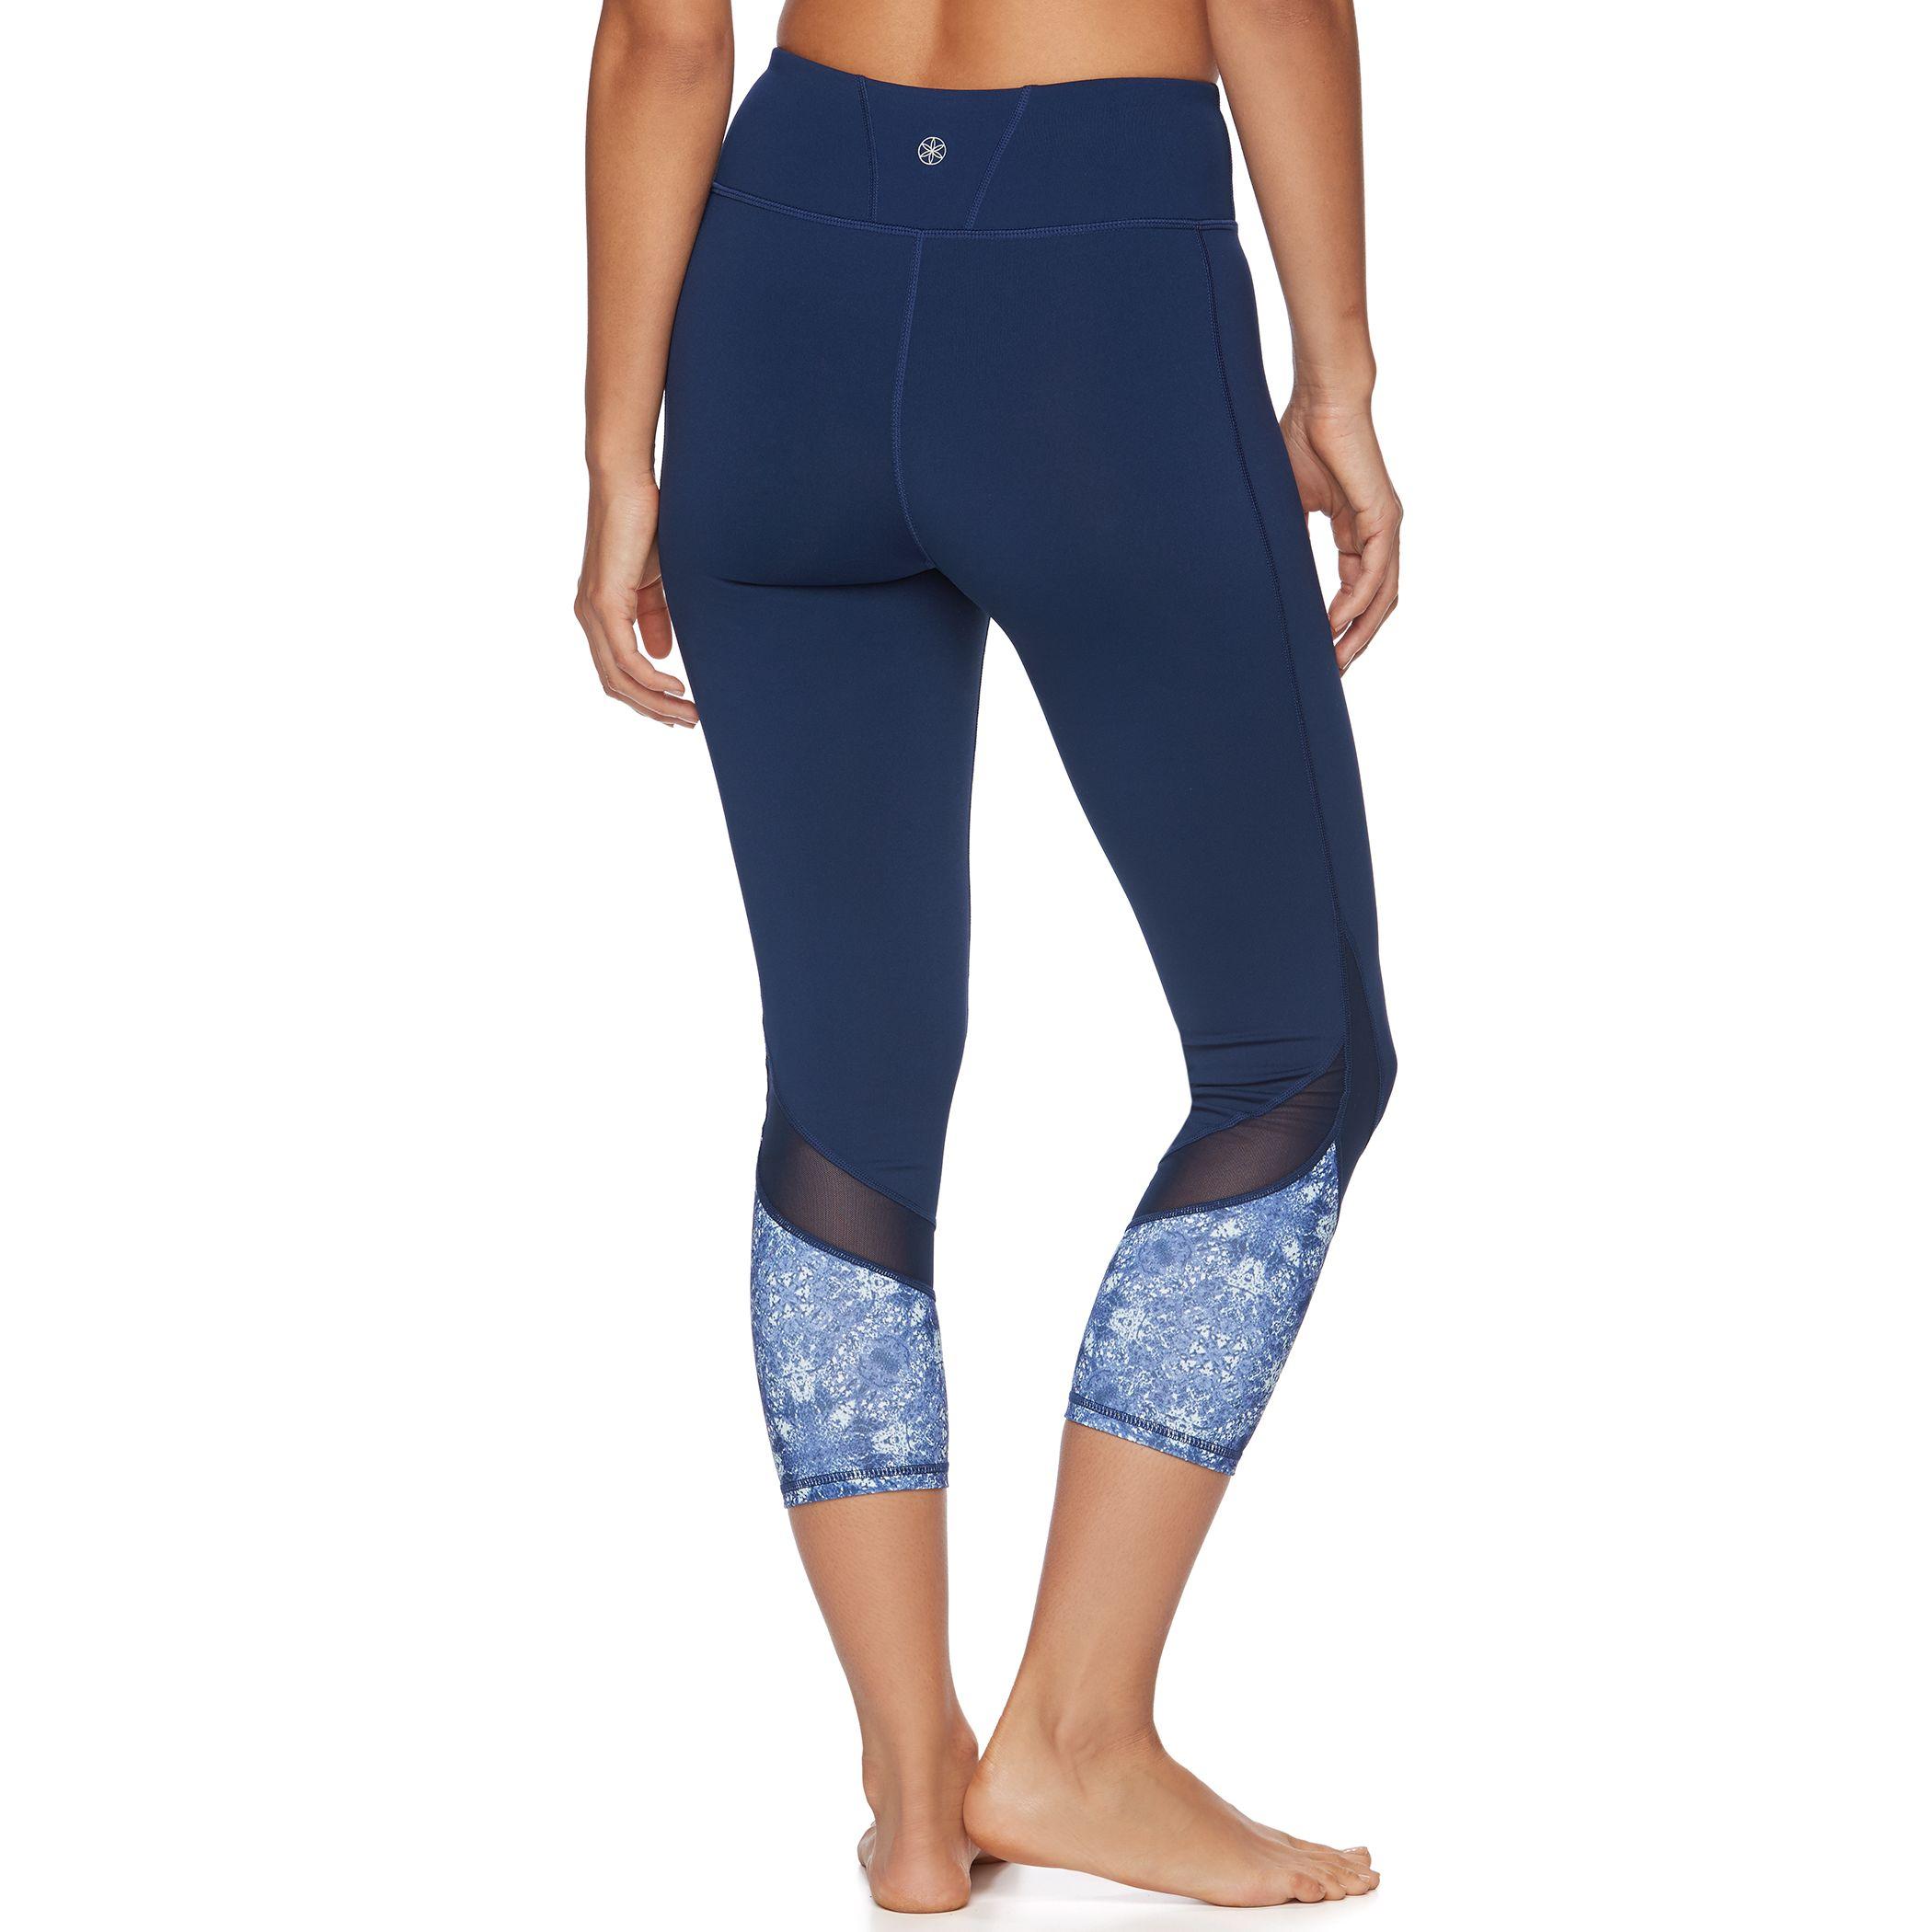 ed39539f9c48d Womens Gaiam Leggings | Kohl's